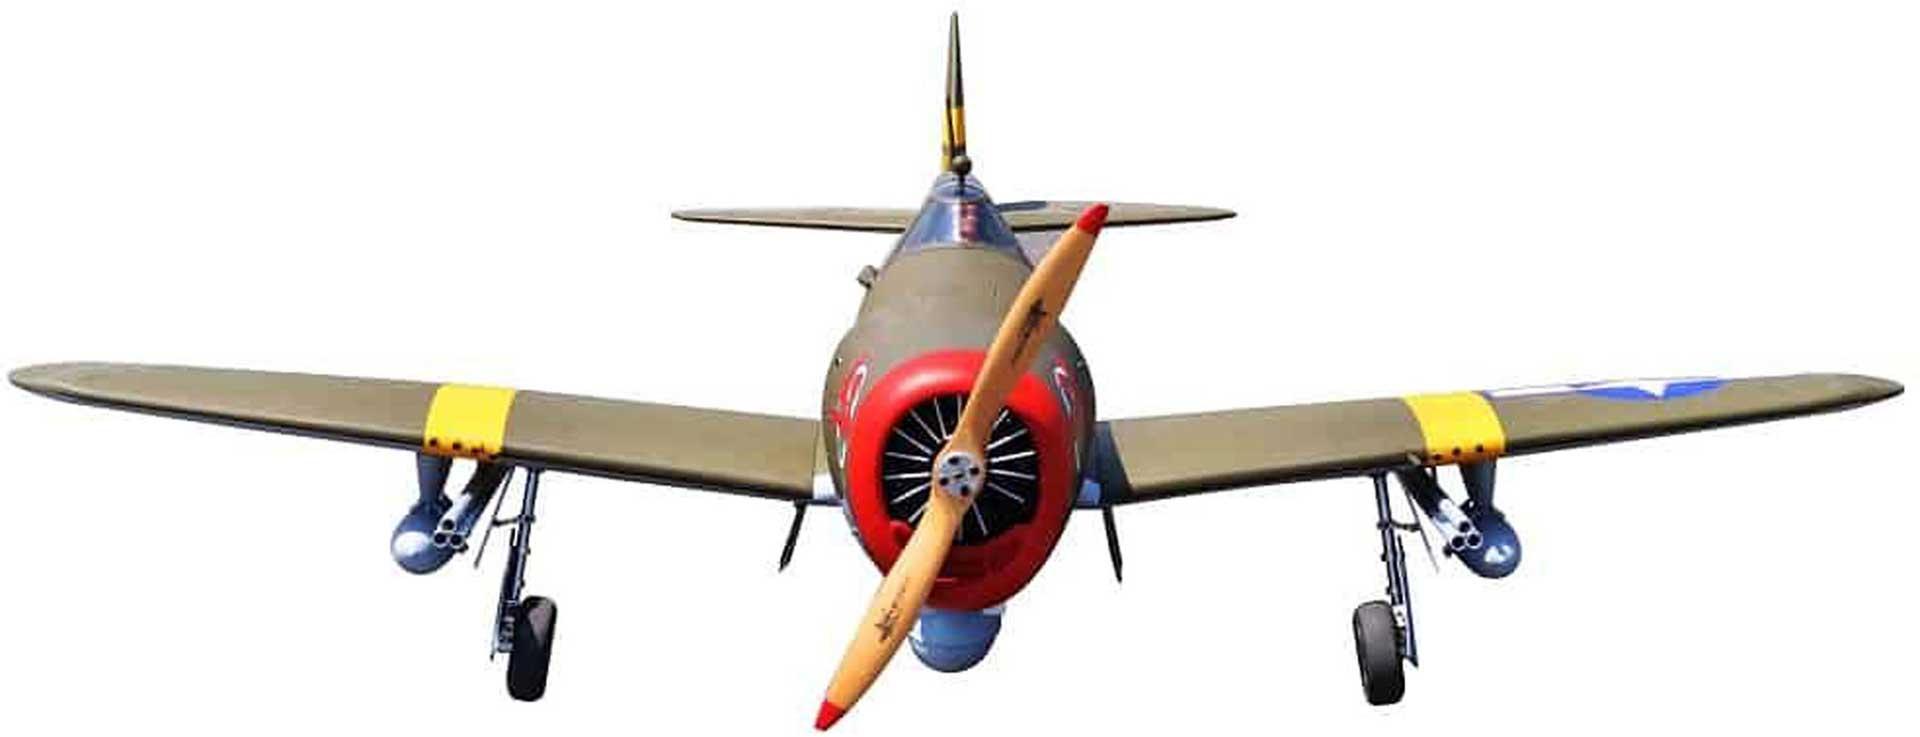 SG-MODELS P-47 THUNDERBOLT RAZORBACK ARF WARBIRD GIANT SCALE 2,06M